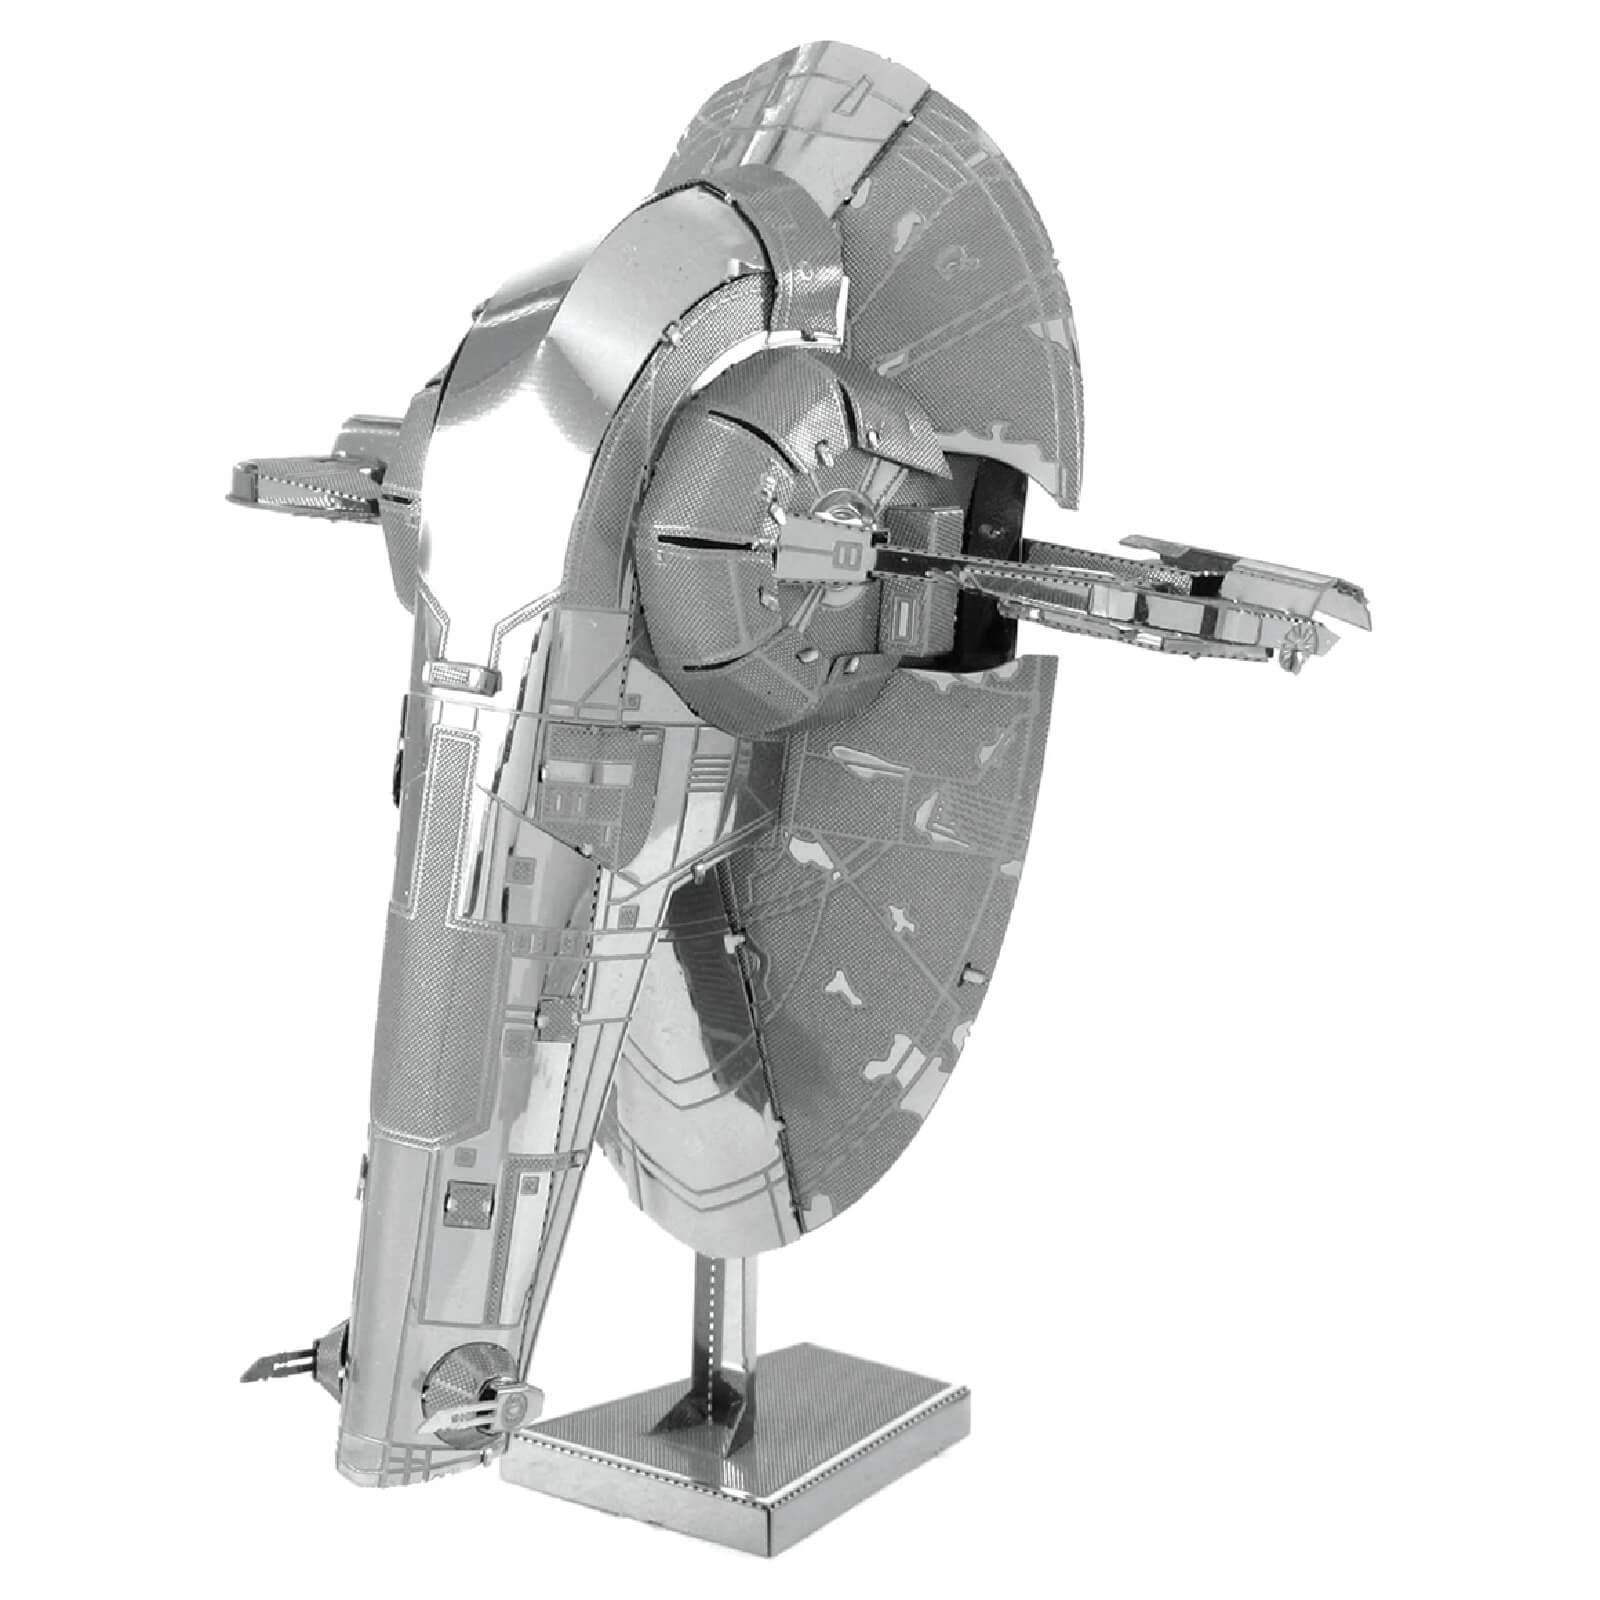 Professor Puzzle Star Wars Slave I Metal Earth Construction Kit